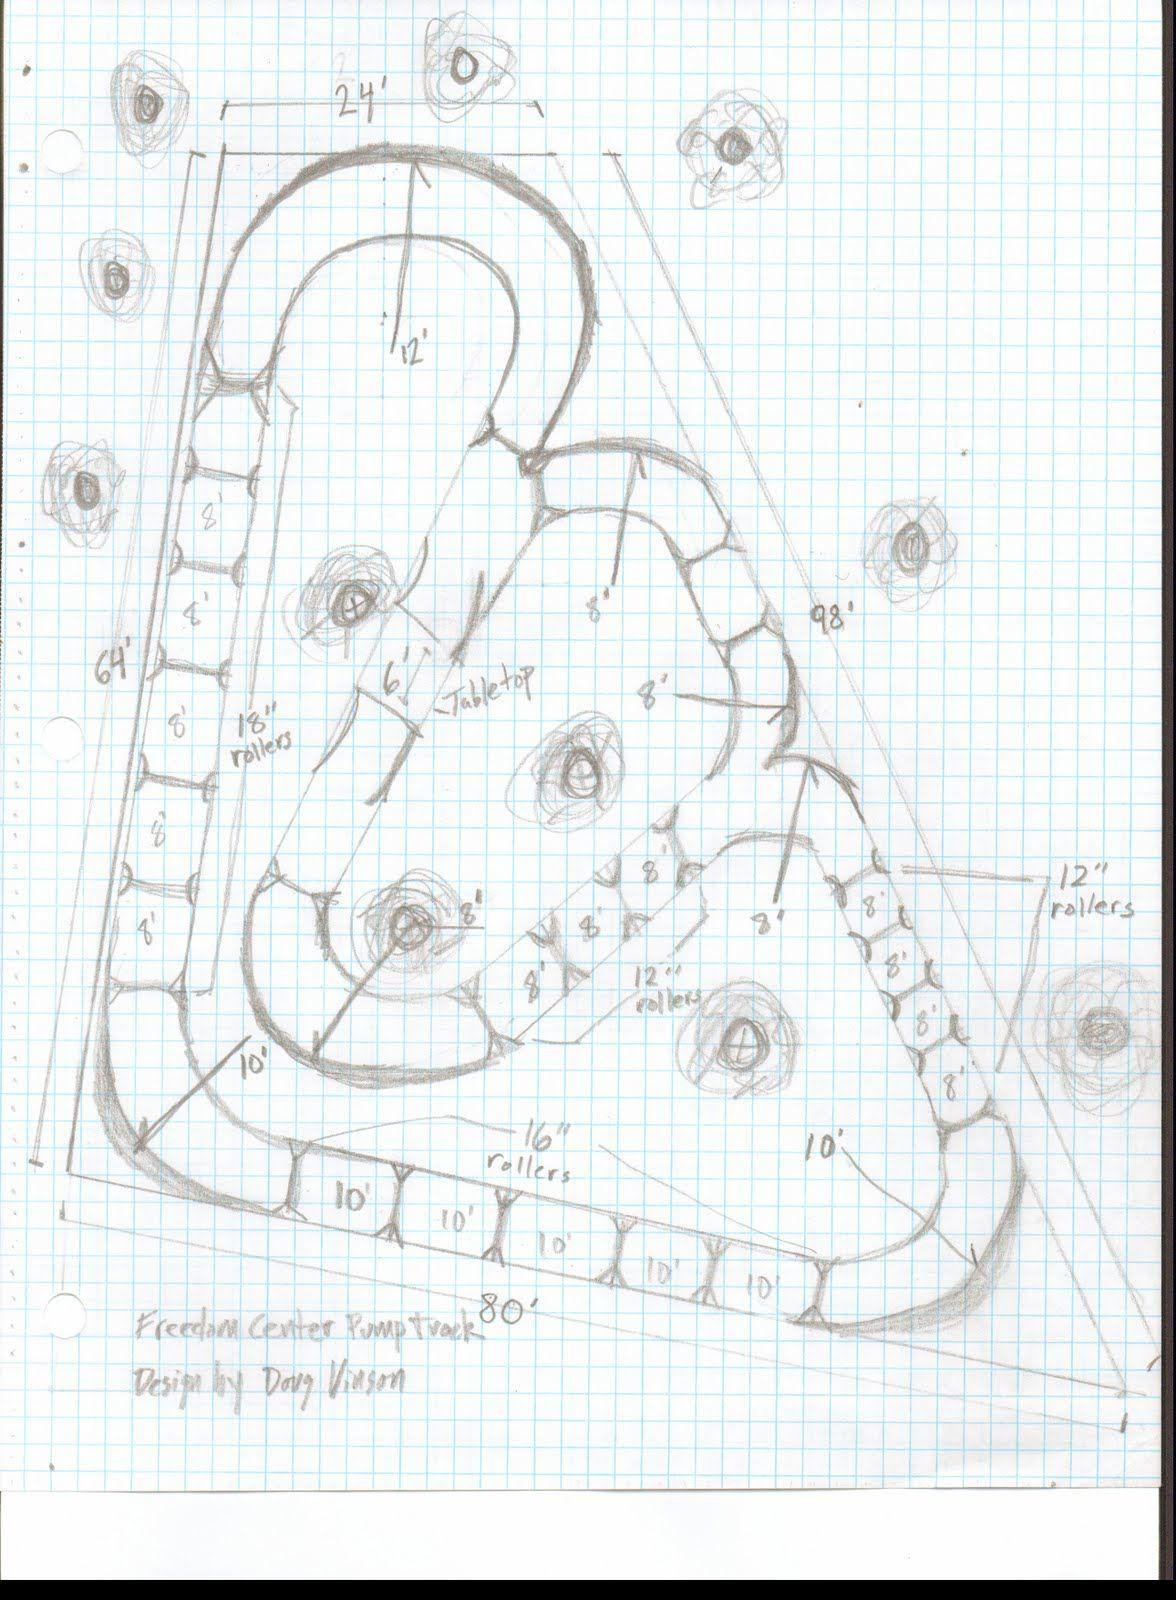 Vinson Trail Works: Freedom Center Pump Track Design